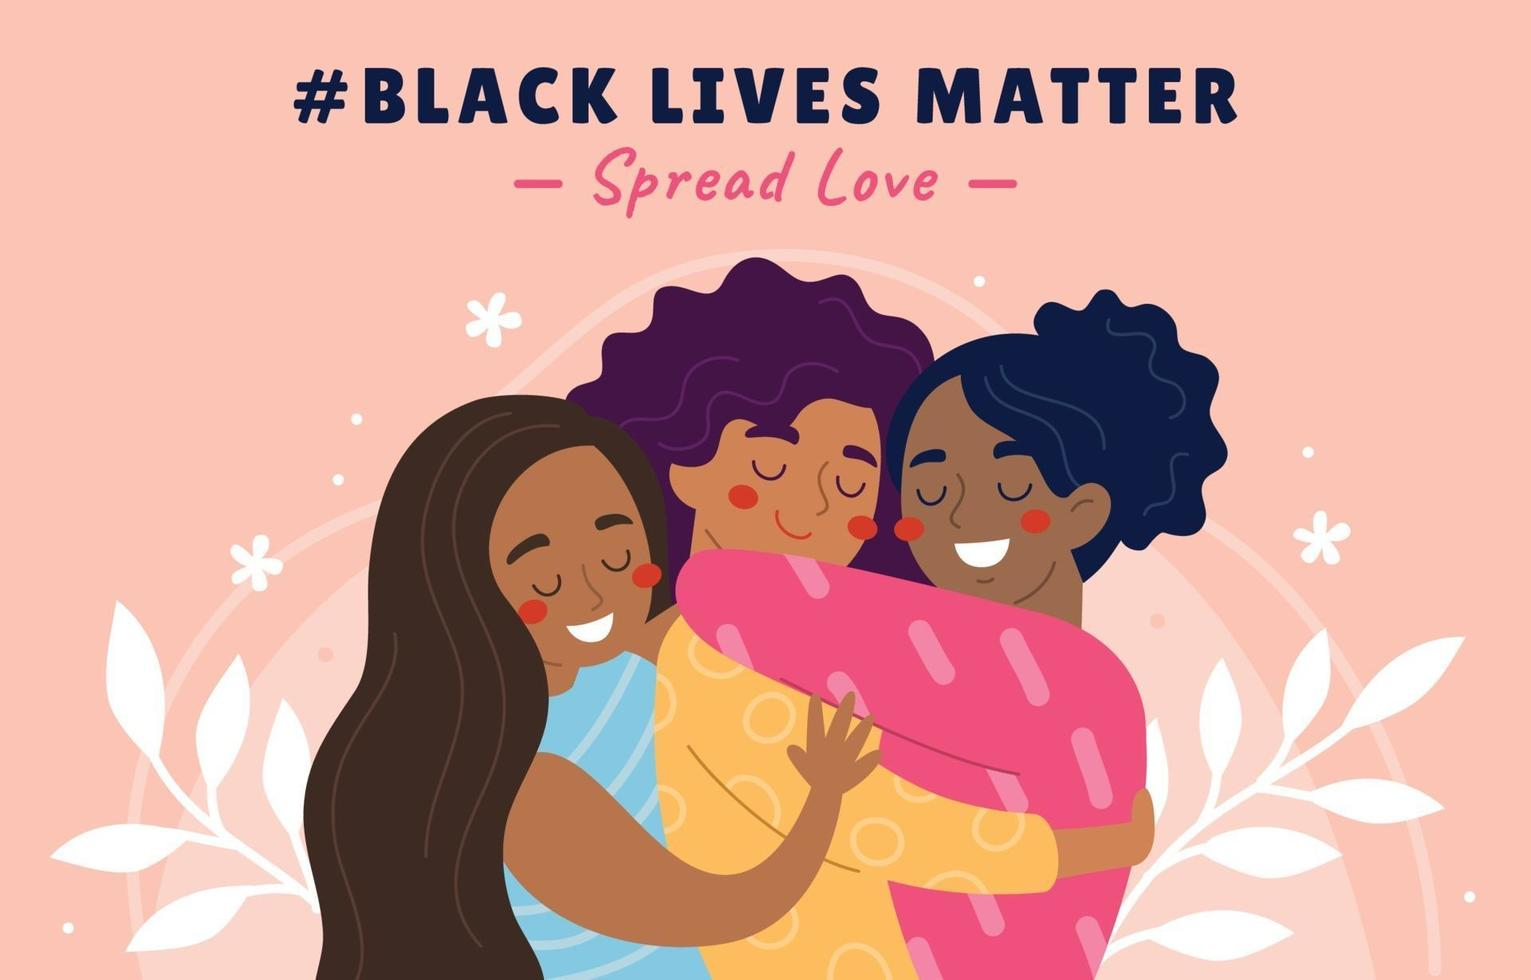 Spread Love Black Lives Matter Campaign Poster vector